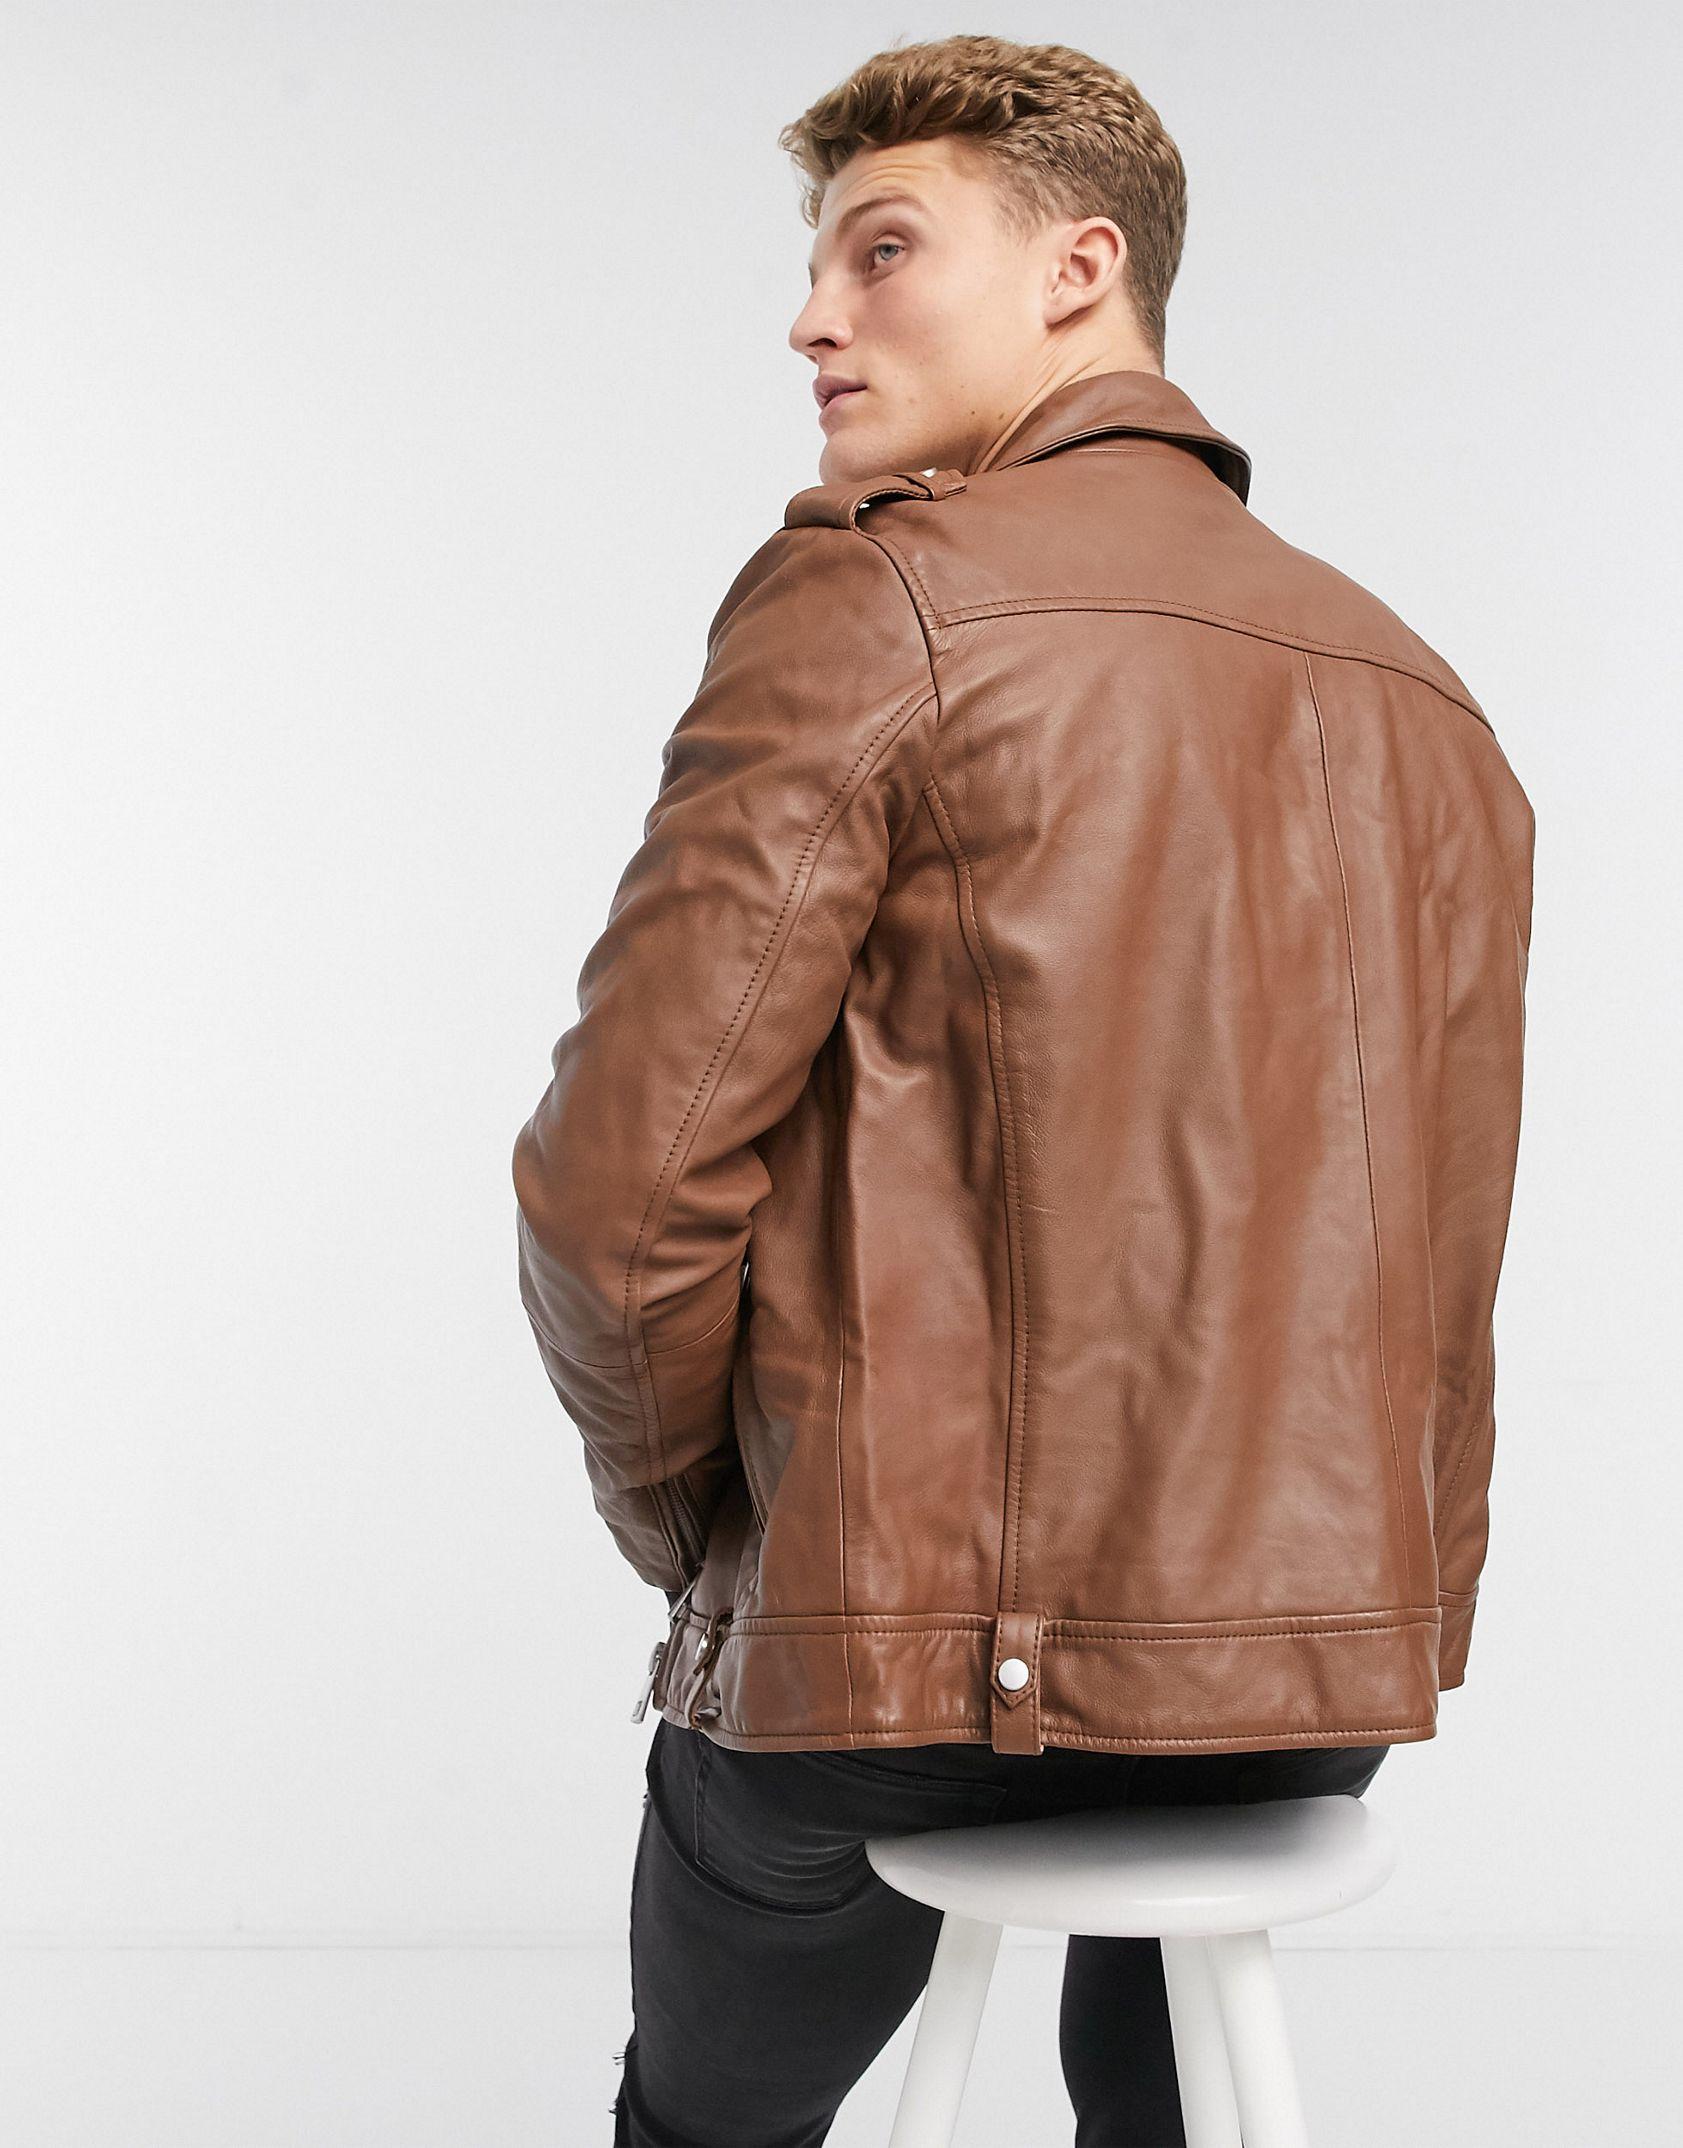 ASOS DESIGN leather biker jacket in tan -  Price Checker